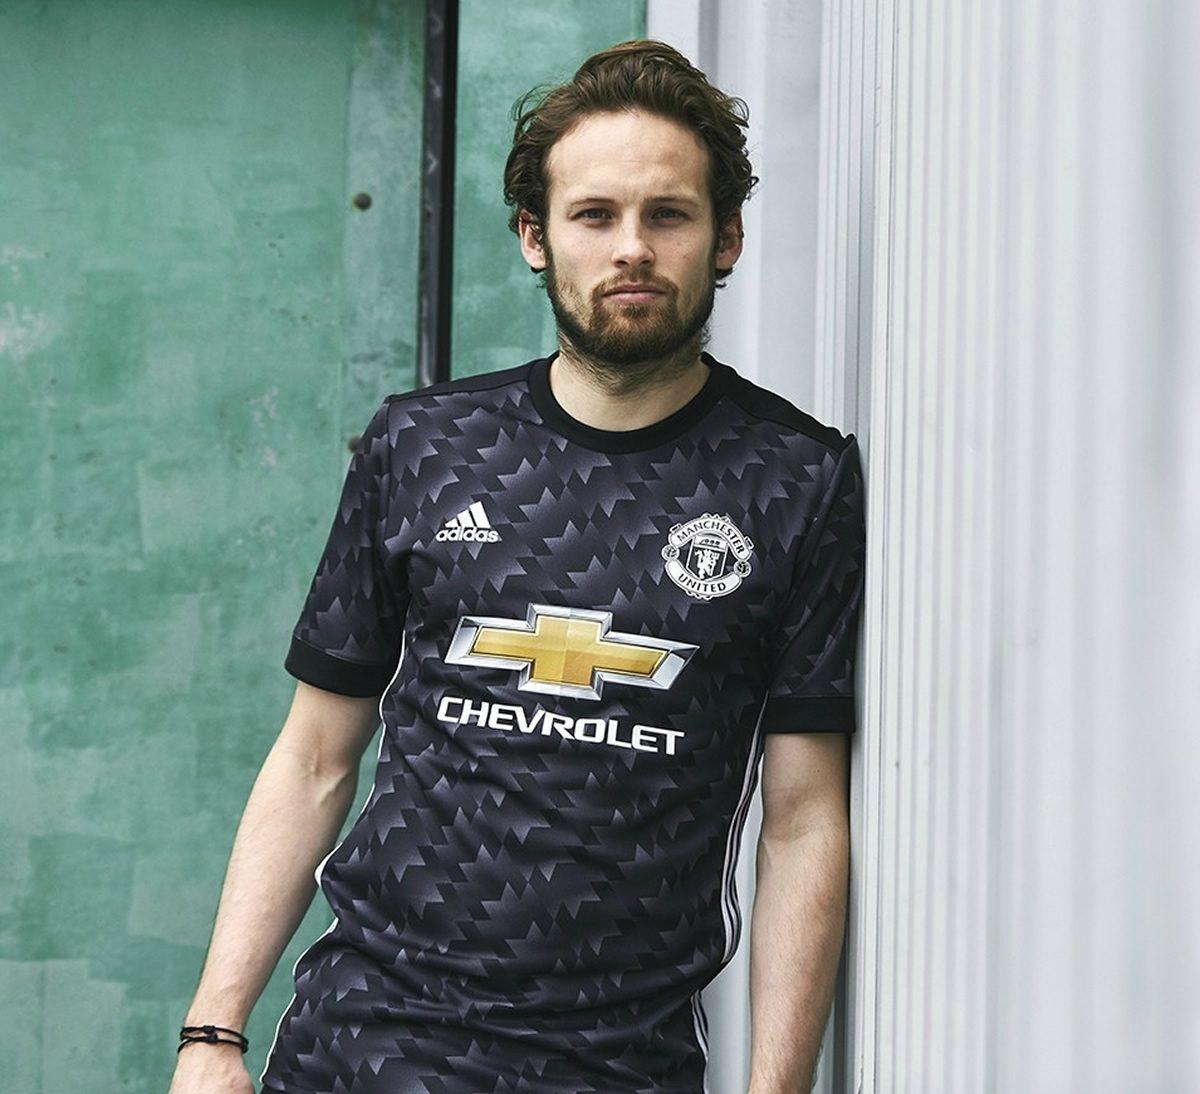 aa3abc73a Camiseta suplente Adidas del Manchester United 2017 2018